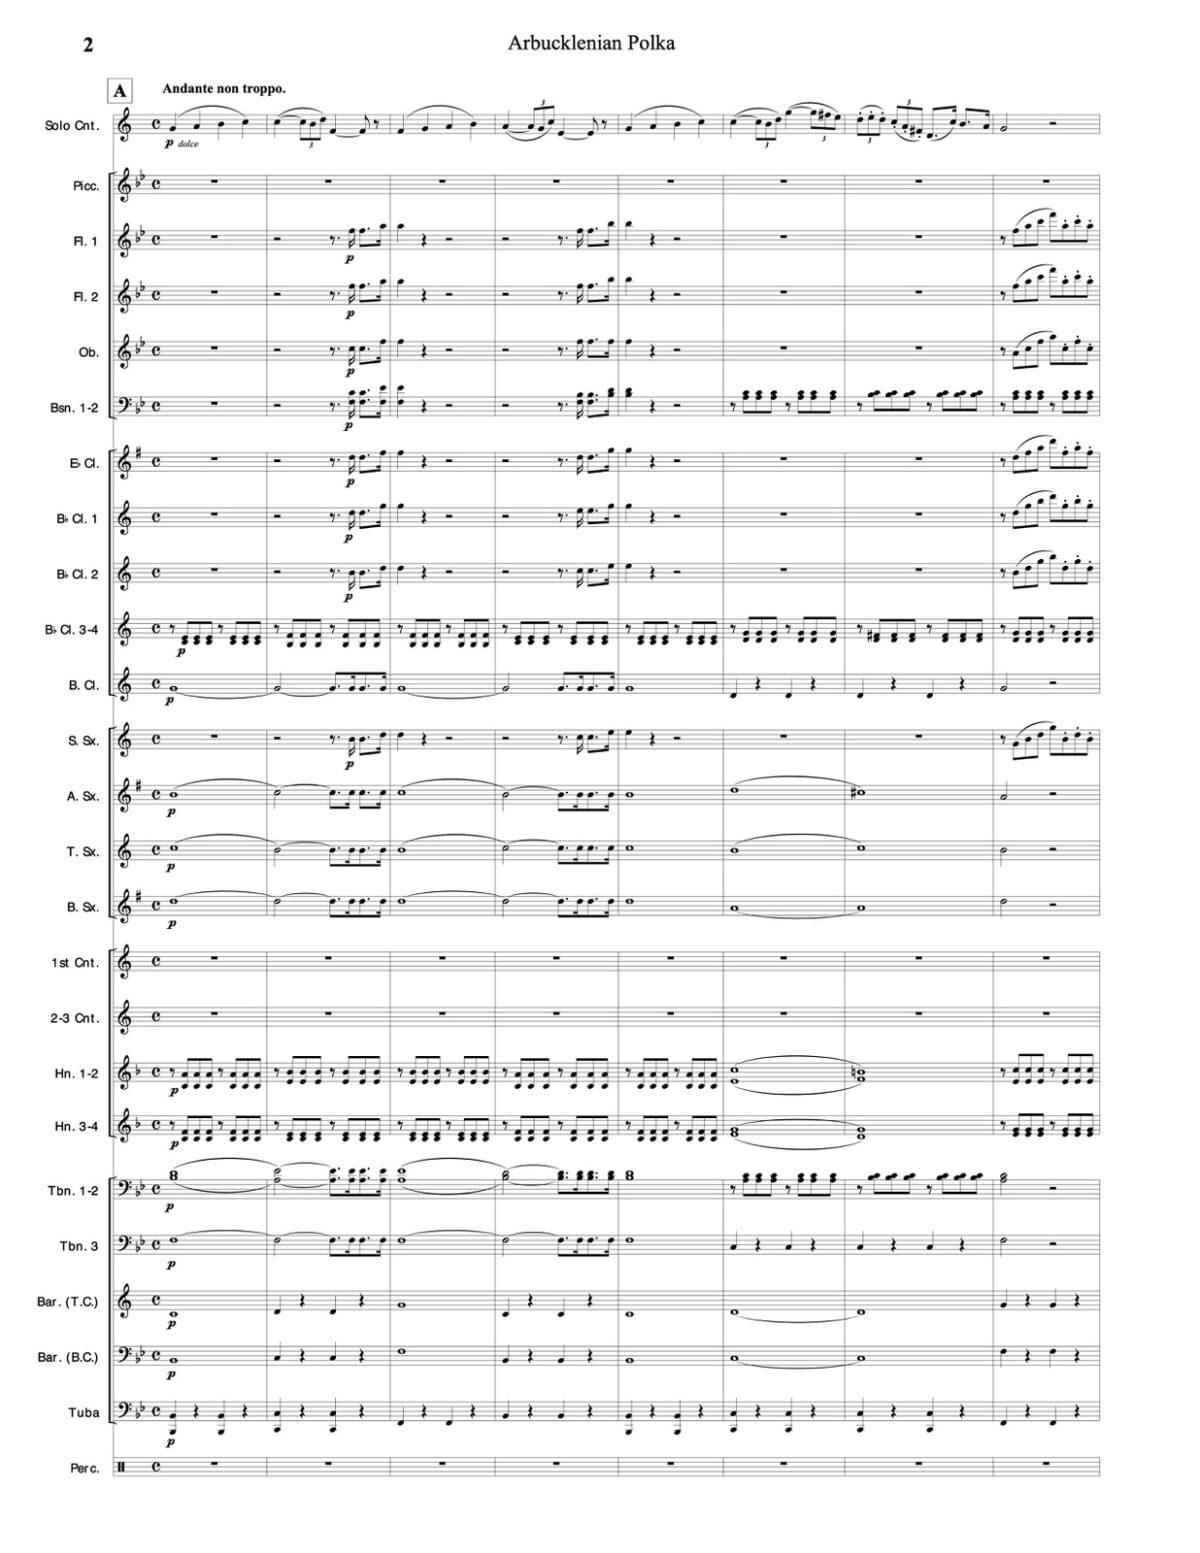 Hartmann, Arbucklenian Polka for Cornet and Band-p094